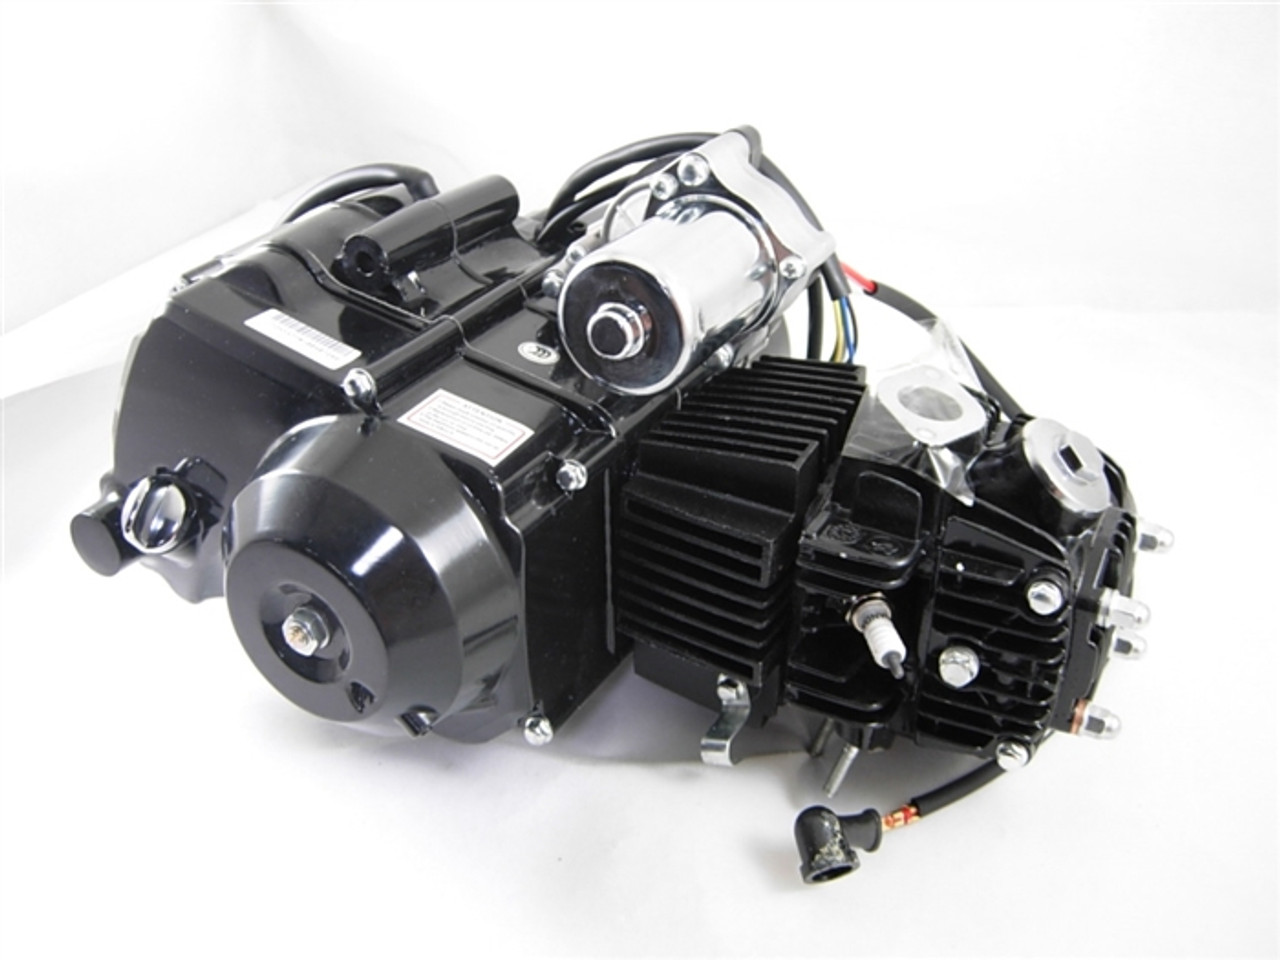 engine 110 cc auto w/ reverse 90050-9005-1